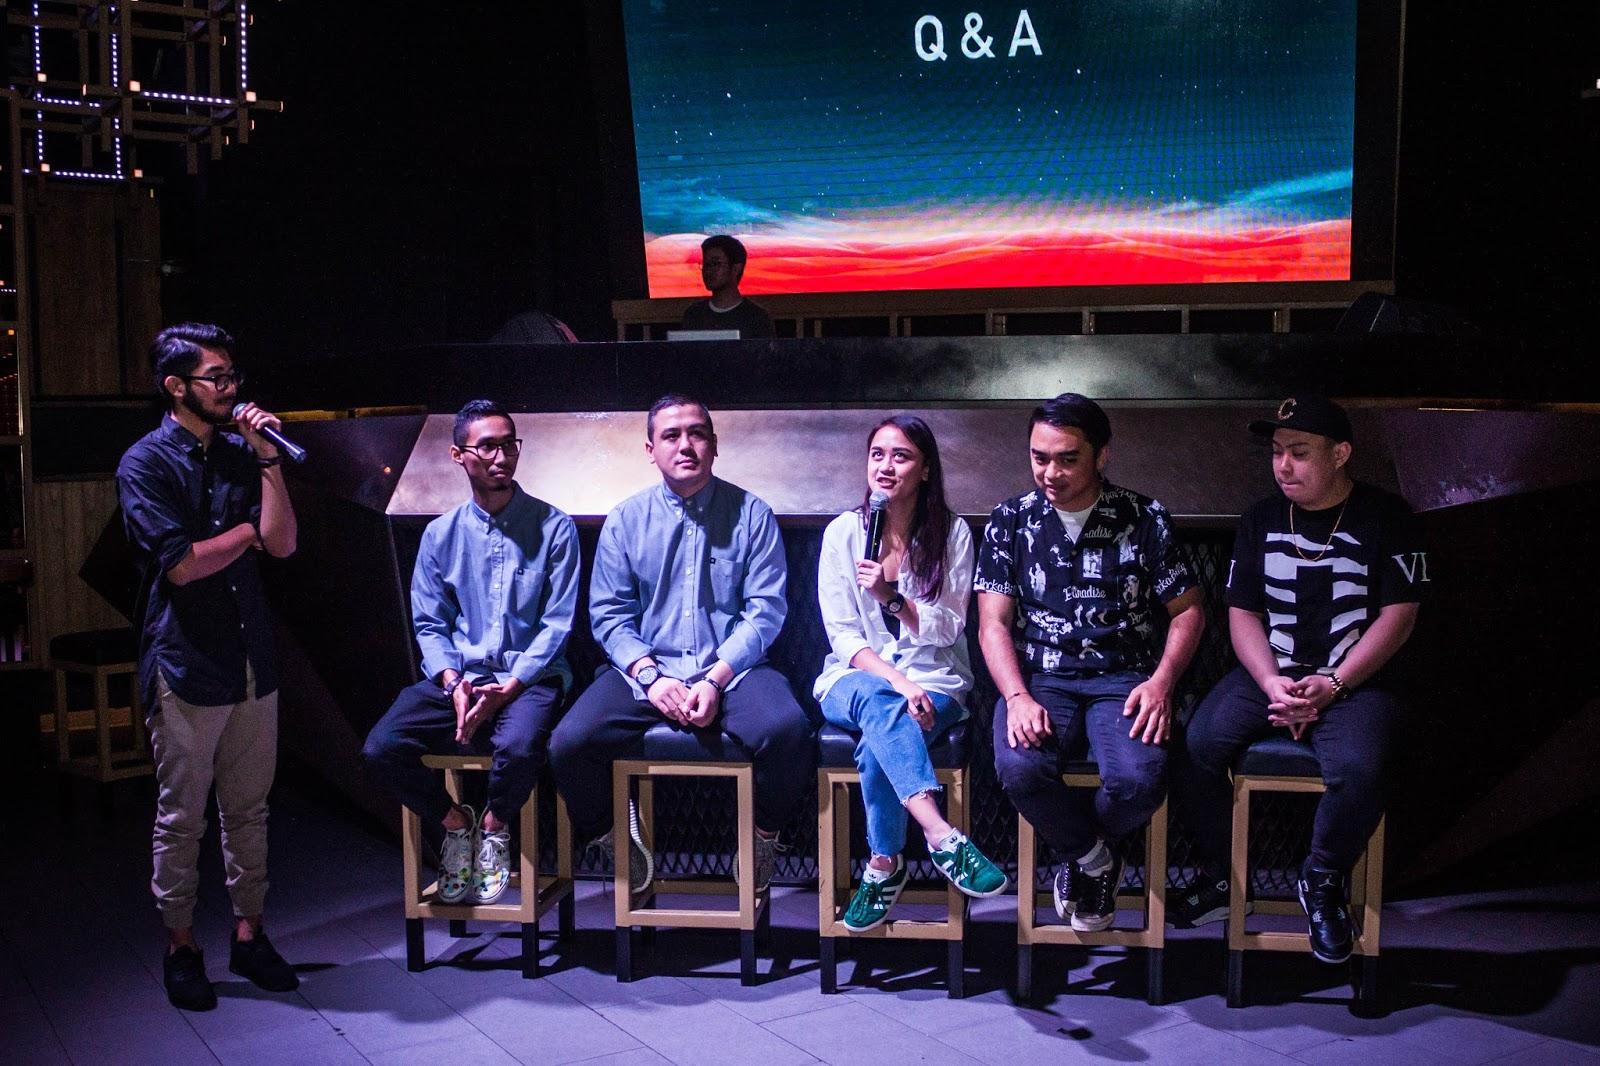 Informasi Harga Tiket Djakarta Warehouse Project 2016 Musik Jurnal Dwp X Ismaya Live Selaku Promotor Menggelar Konferensi Pers Pertama Pada Hari Rabu Lalu Di Blowfish Jakarta